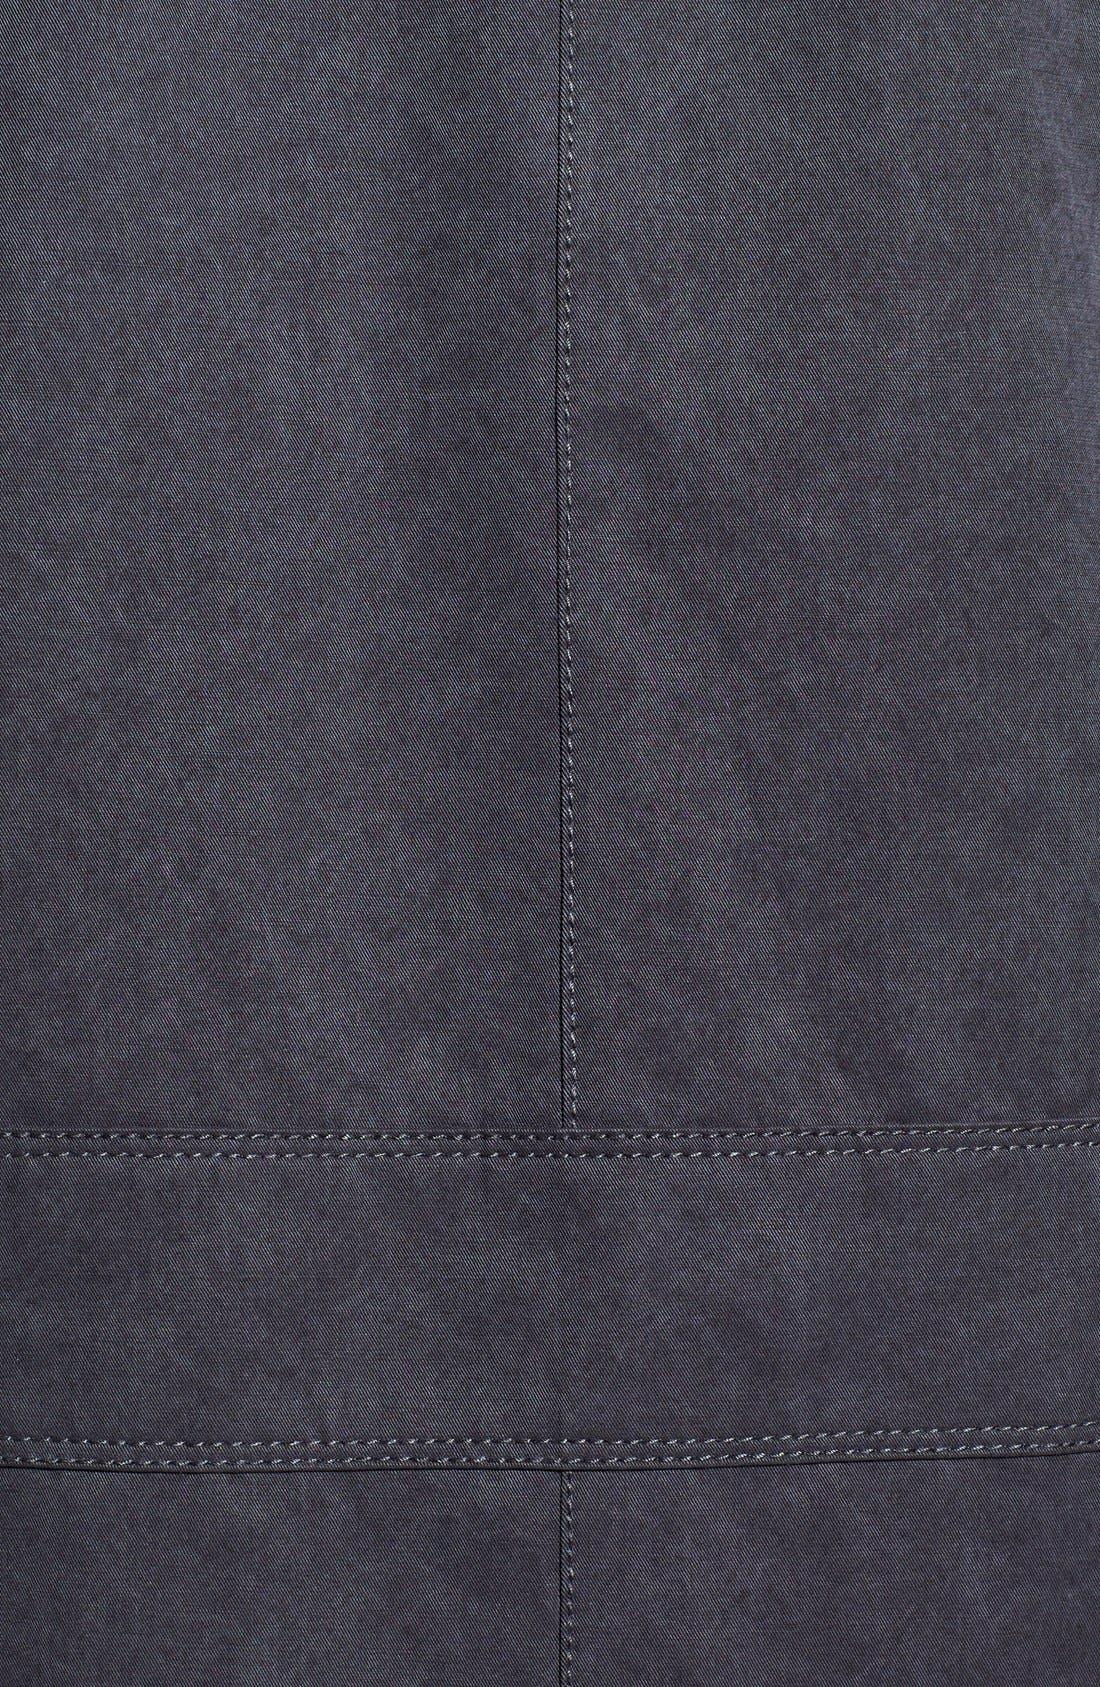 'Kodiak' Water Resistant Coated Hooded Parka,                             Alternate thumbnail 4, color,                             410